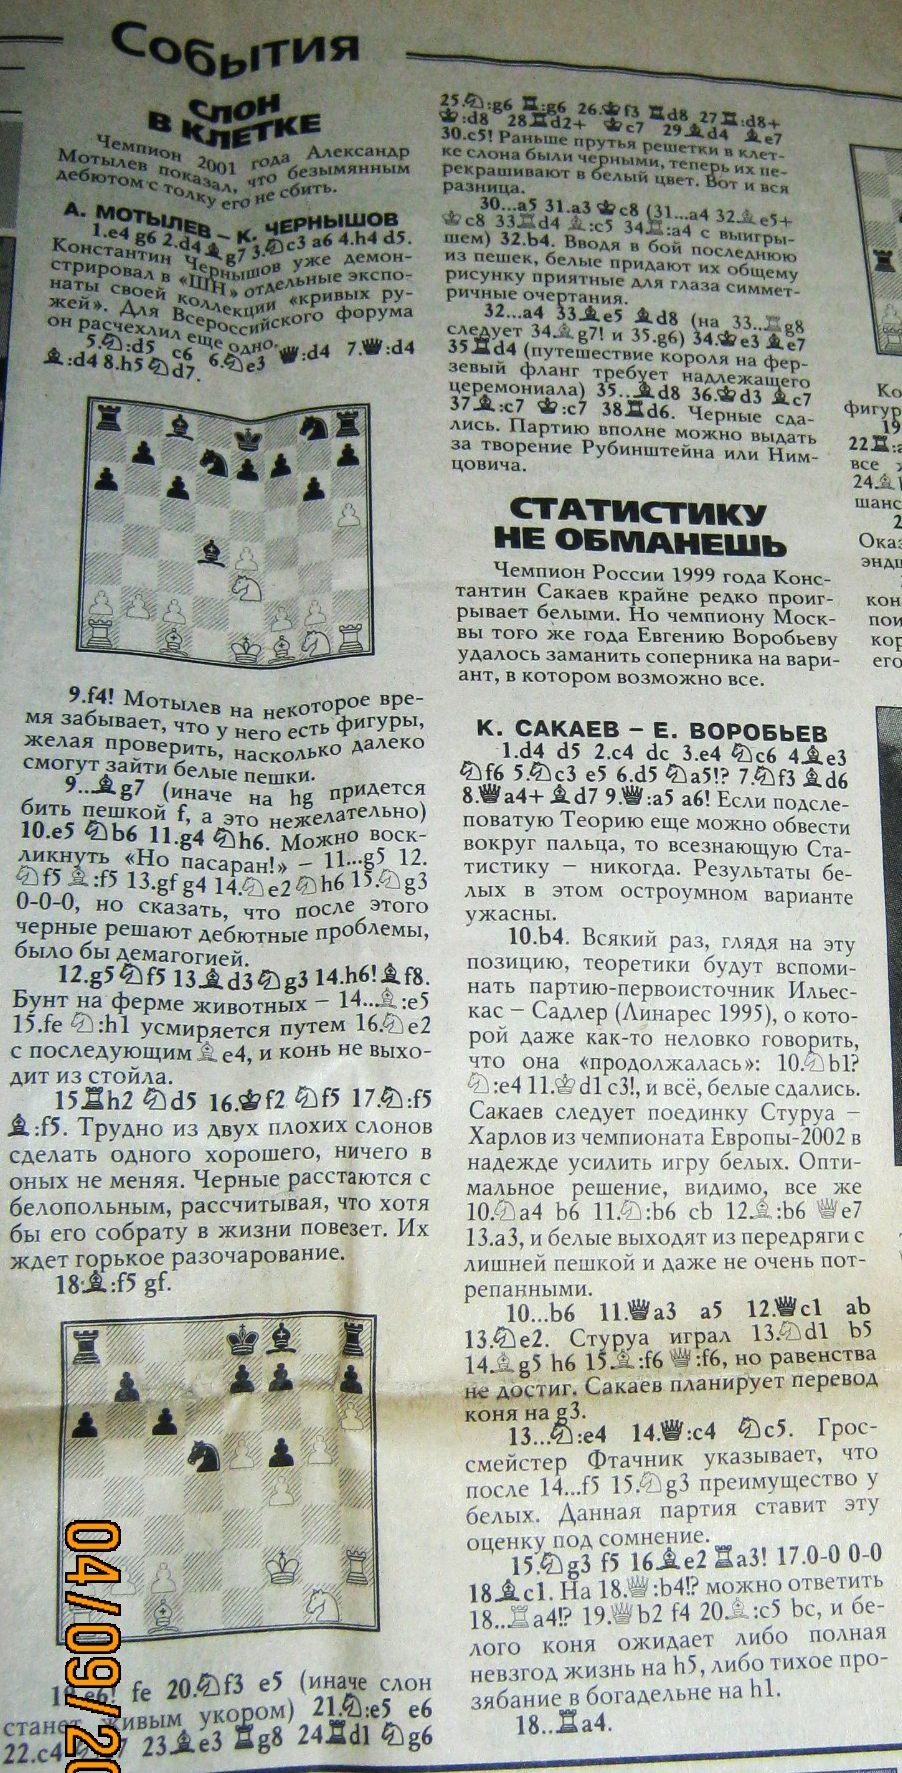 http://img-fotki.yandex.ru/get/4710/236155452.0/0_136d1d_8cac1f47_orig.jpg